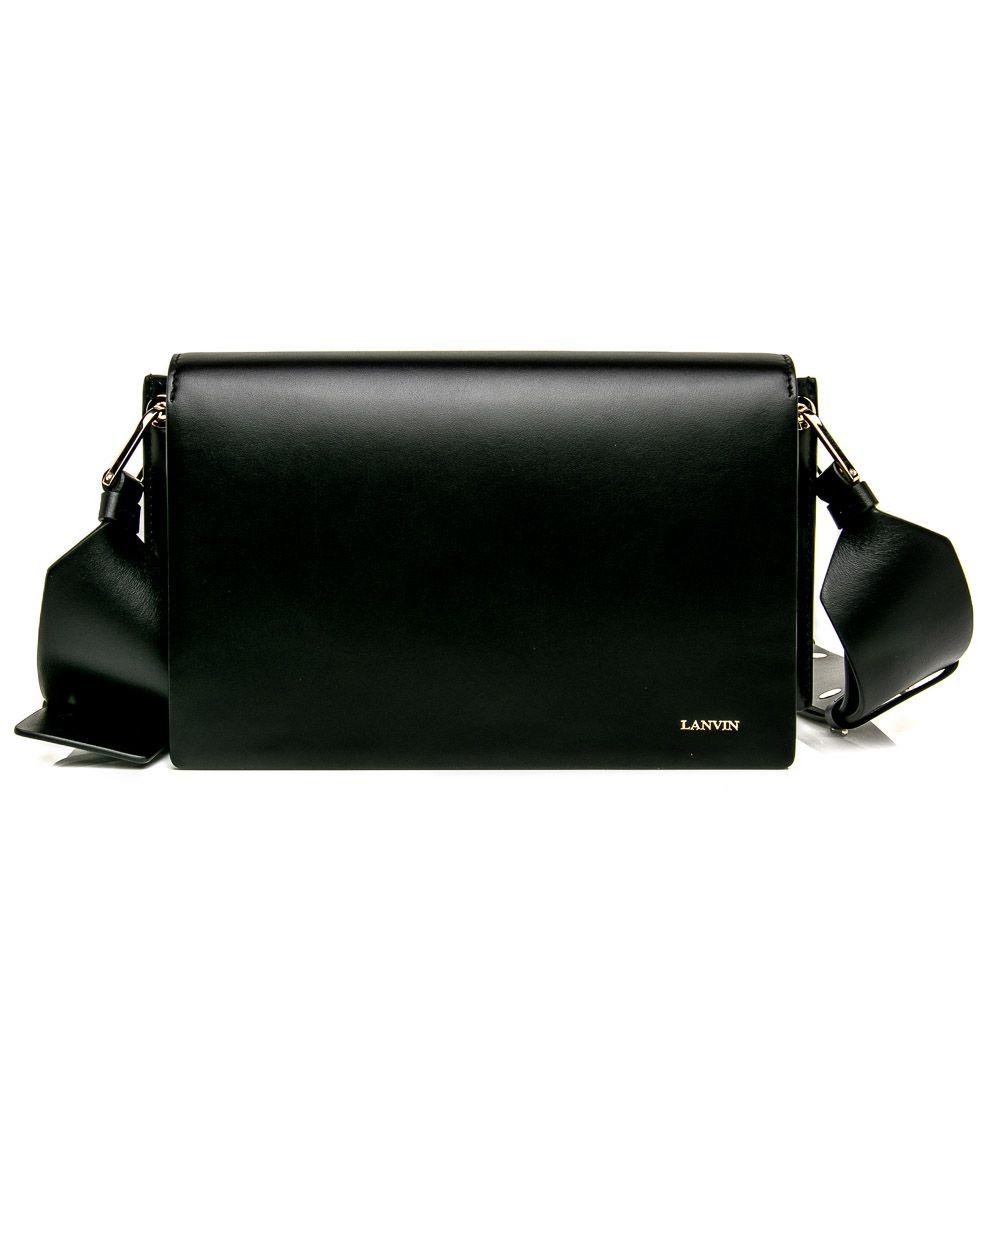 27c35ad4cd Lanvin Black Clutch Bag with Strap | Baggage. | Black clutch bags ...